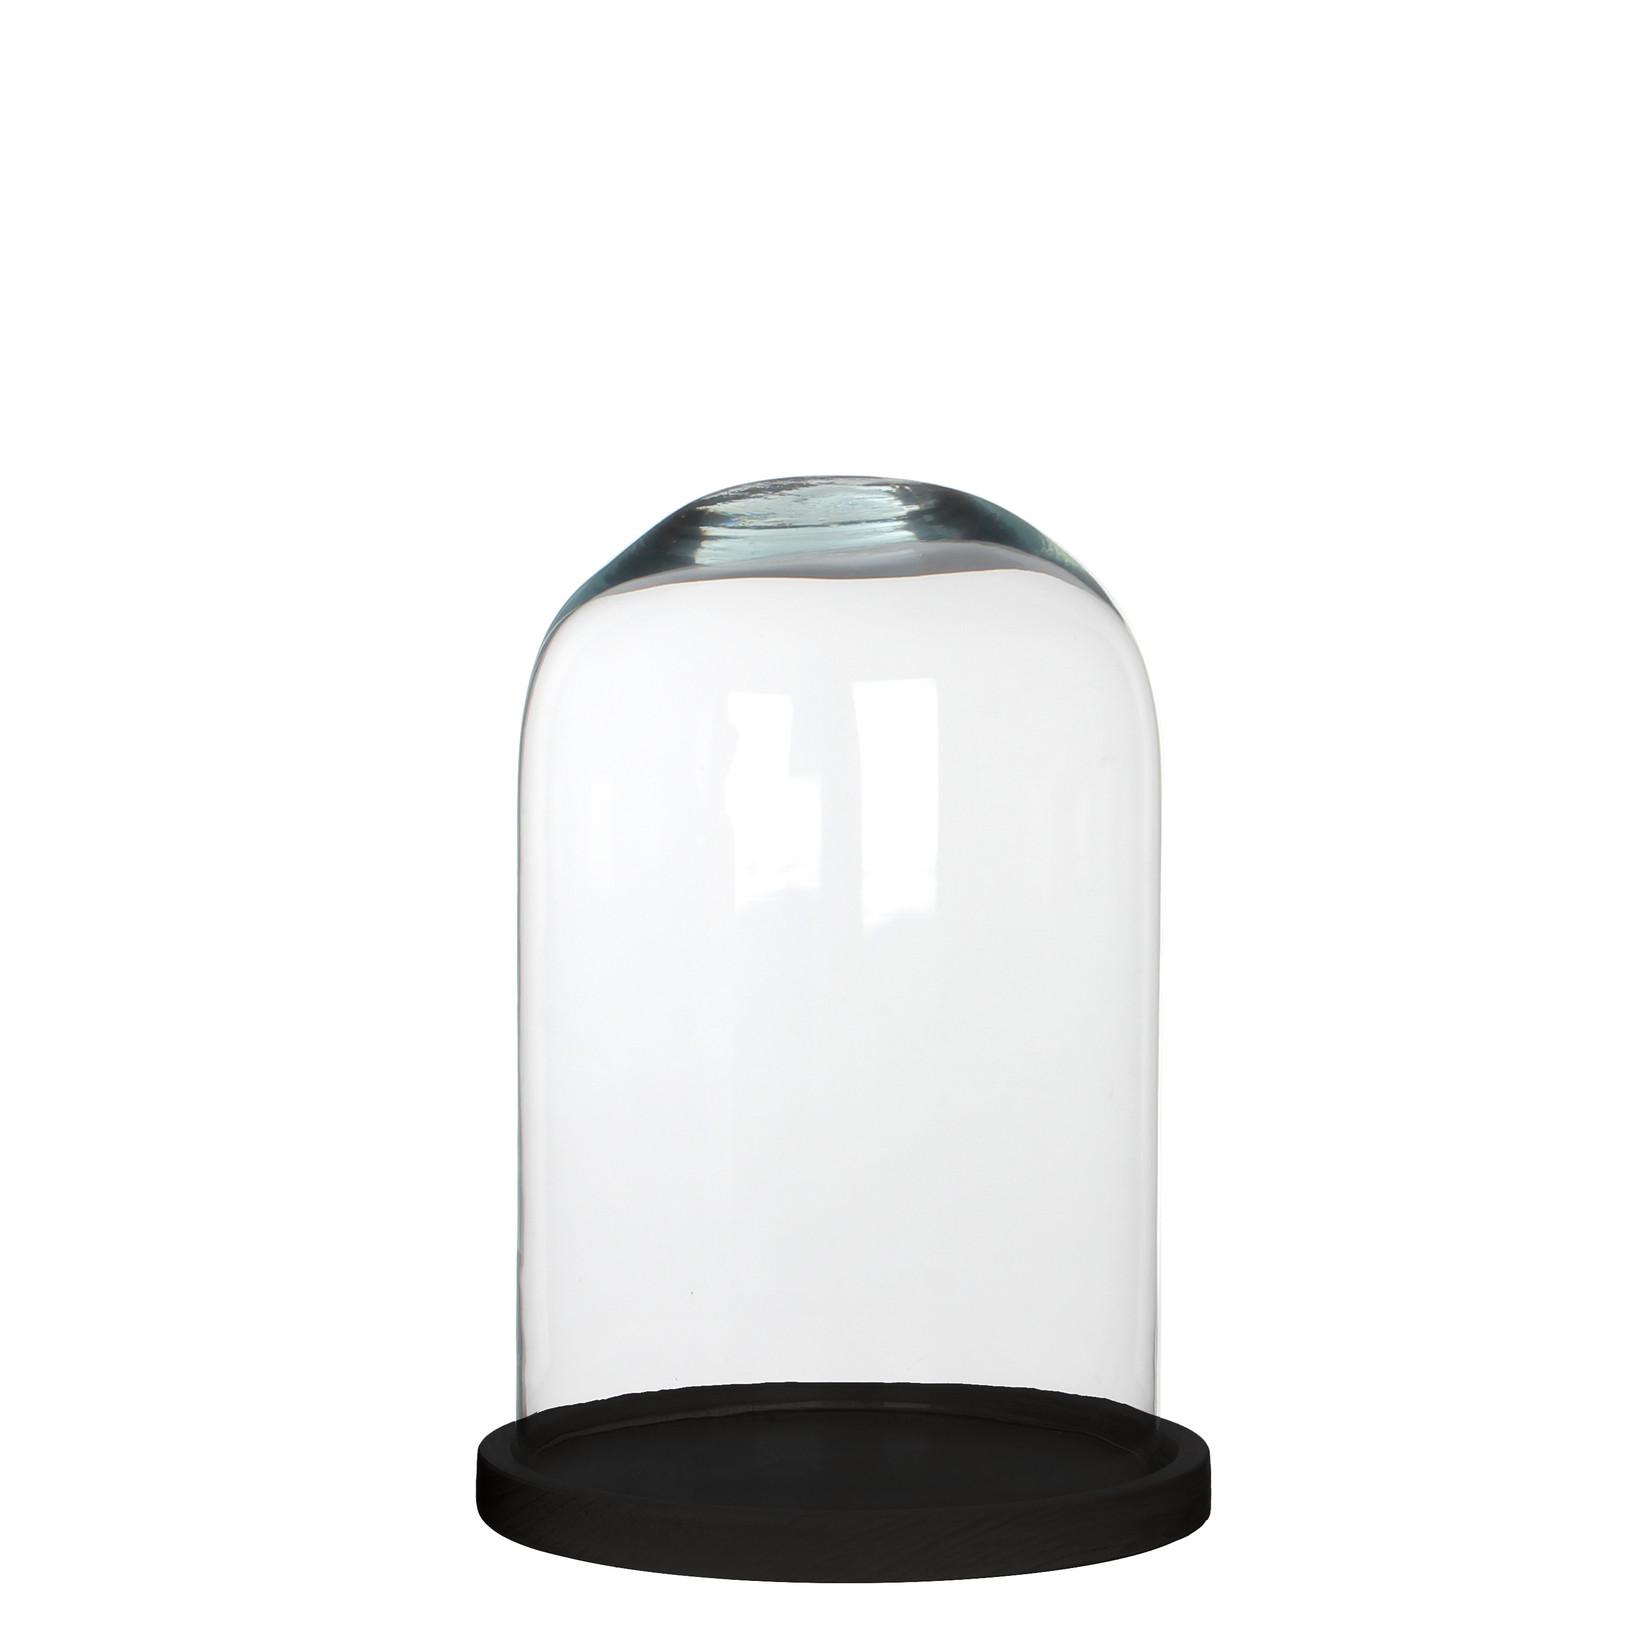 MiCa 1070565 Hella stolp glas op bord zwart